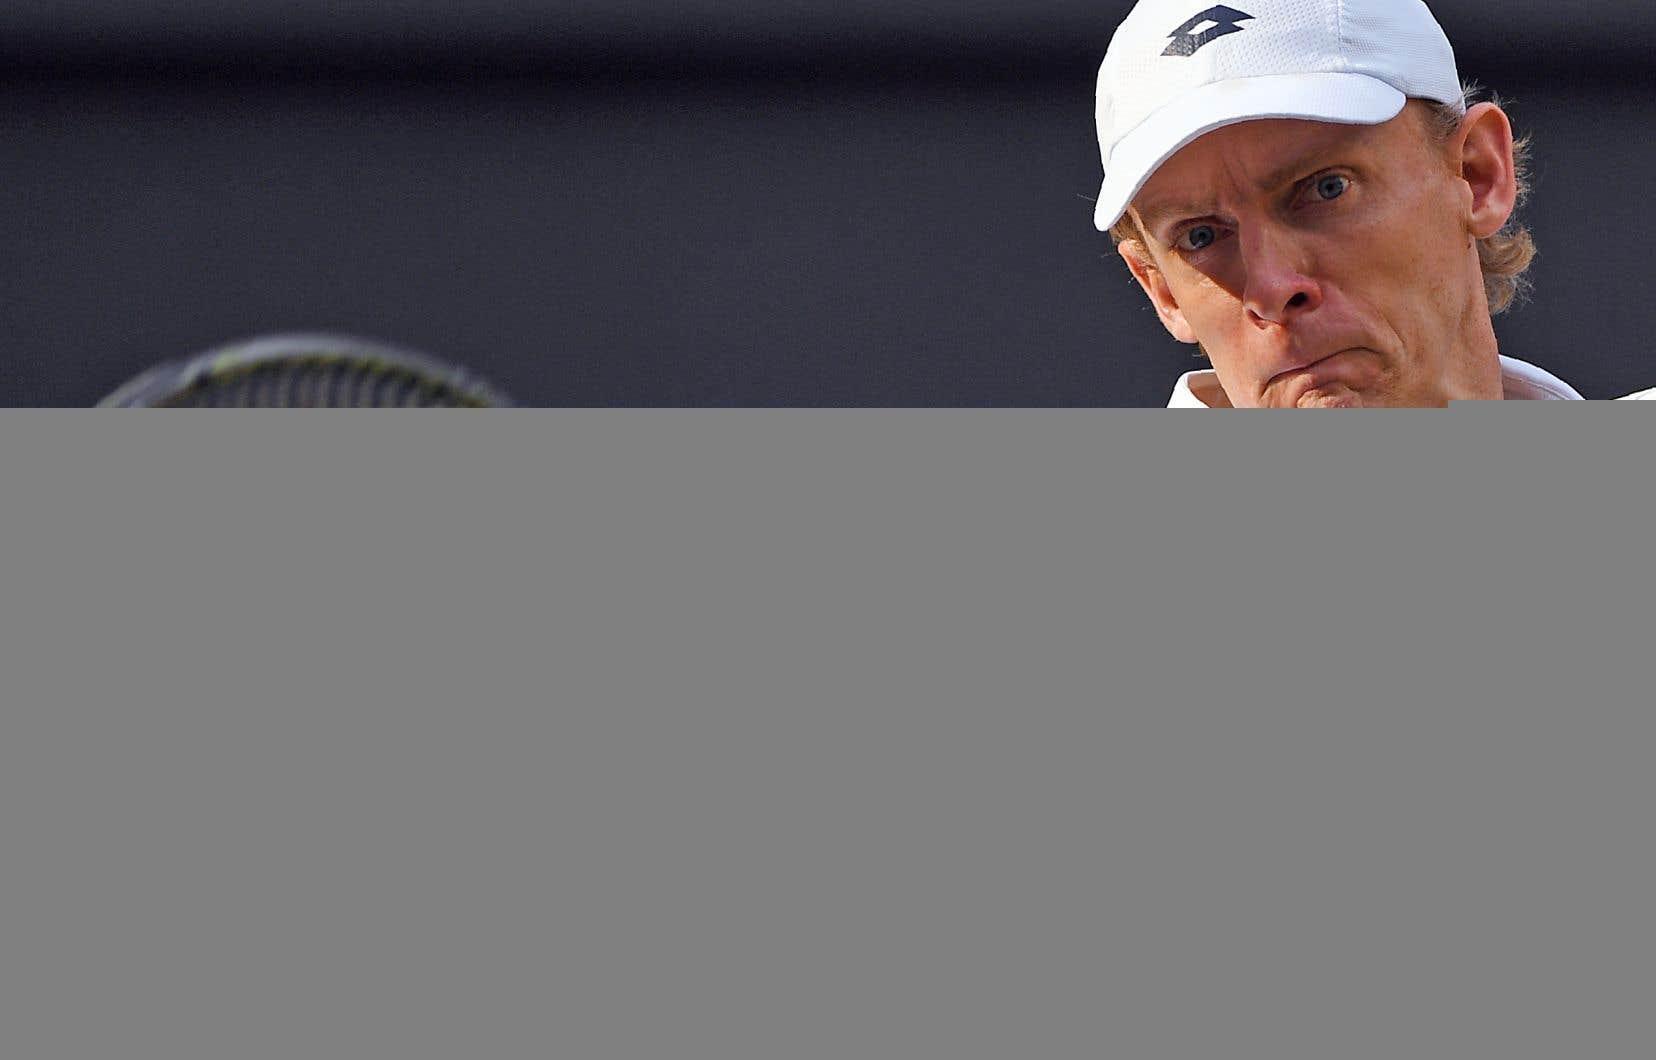 Kevin Anderson affrontera le vainqueur de l'autre demi-finale, qui opposera Rafael Nadal à Novak Djokovic.